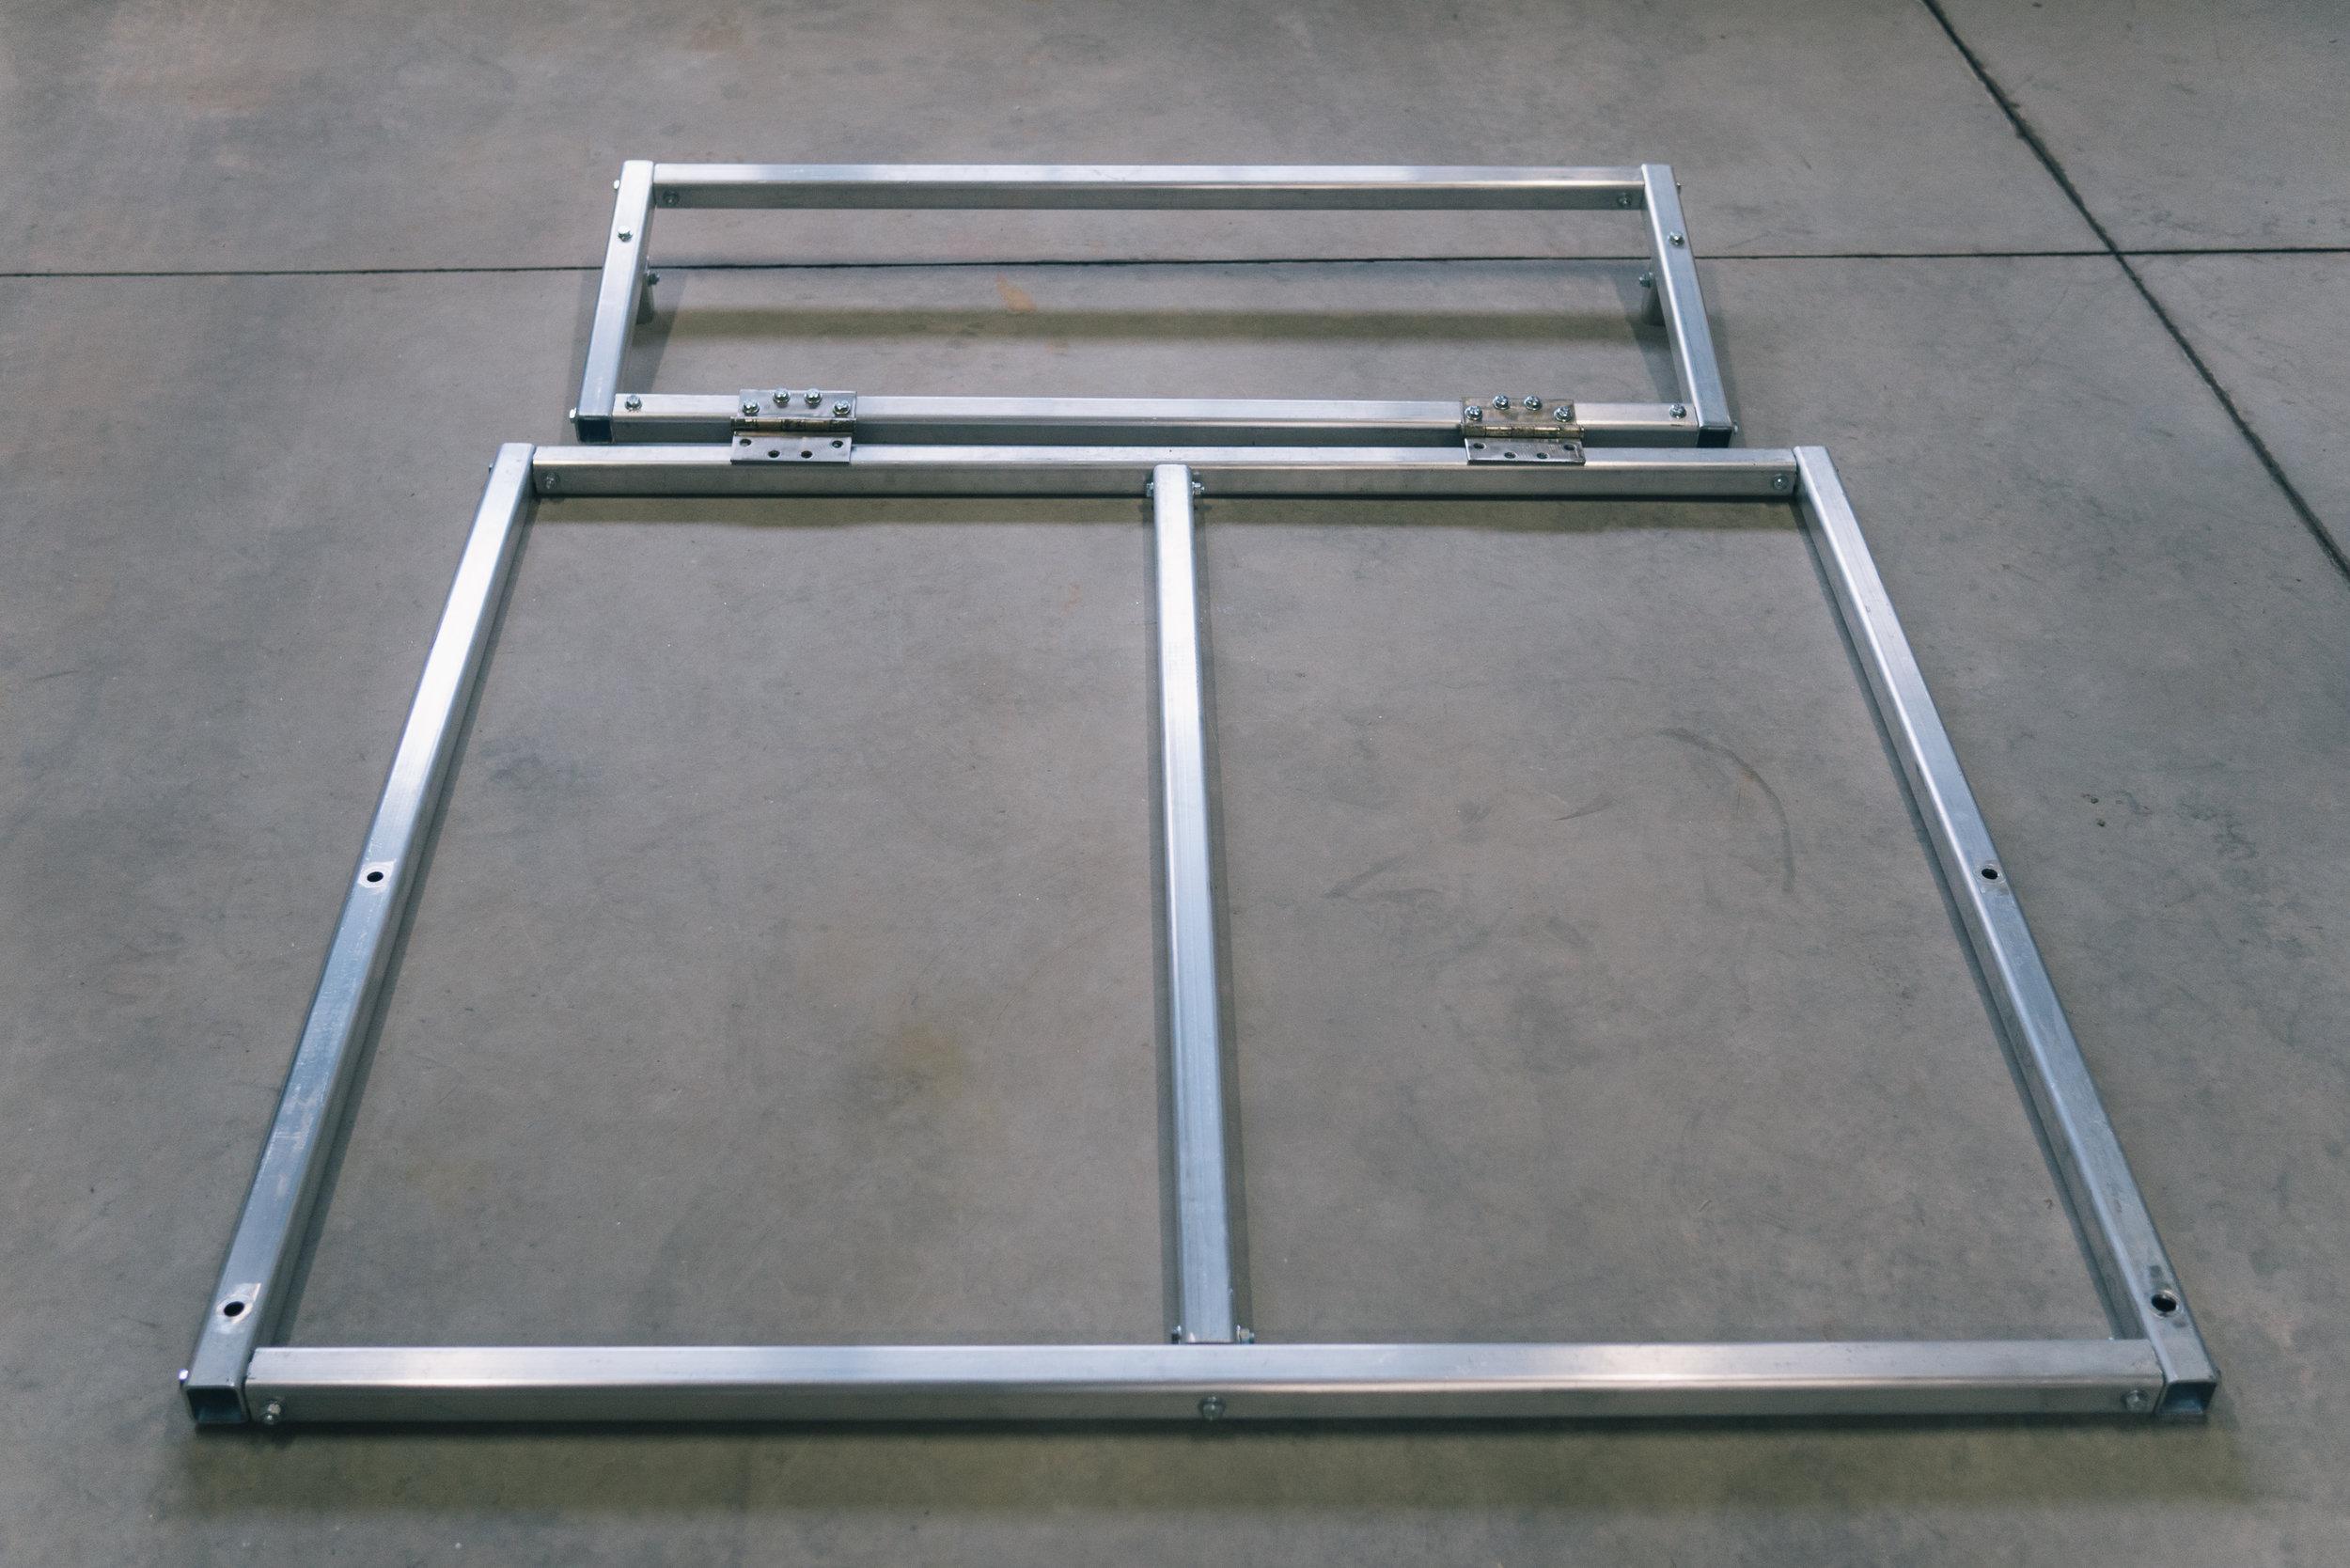 honda-element-bed-platform-van-build.jpg